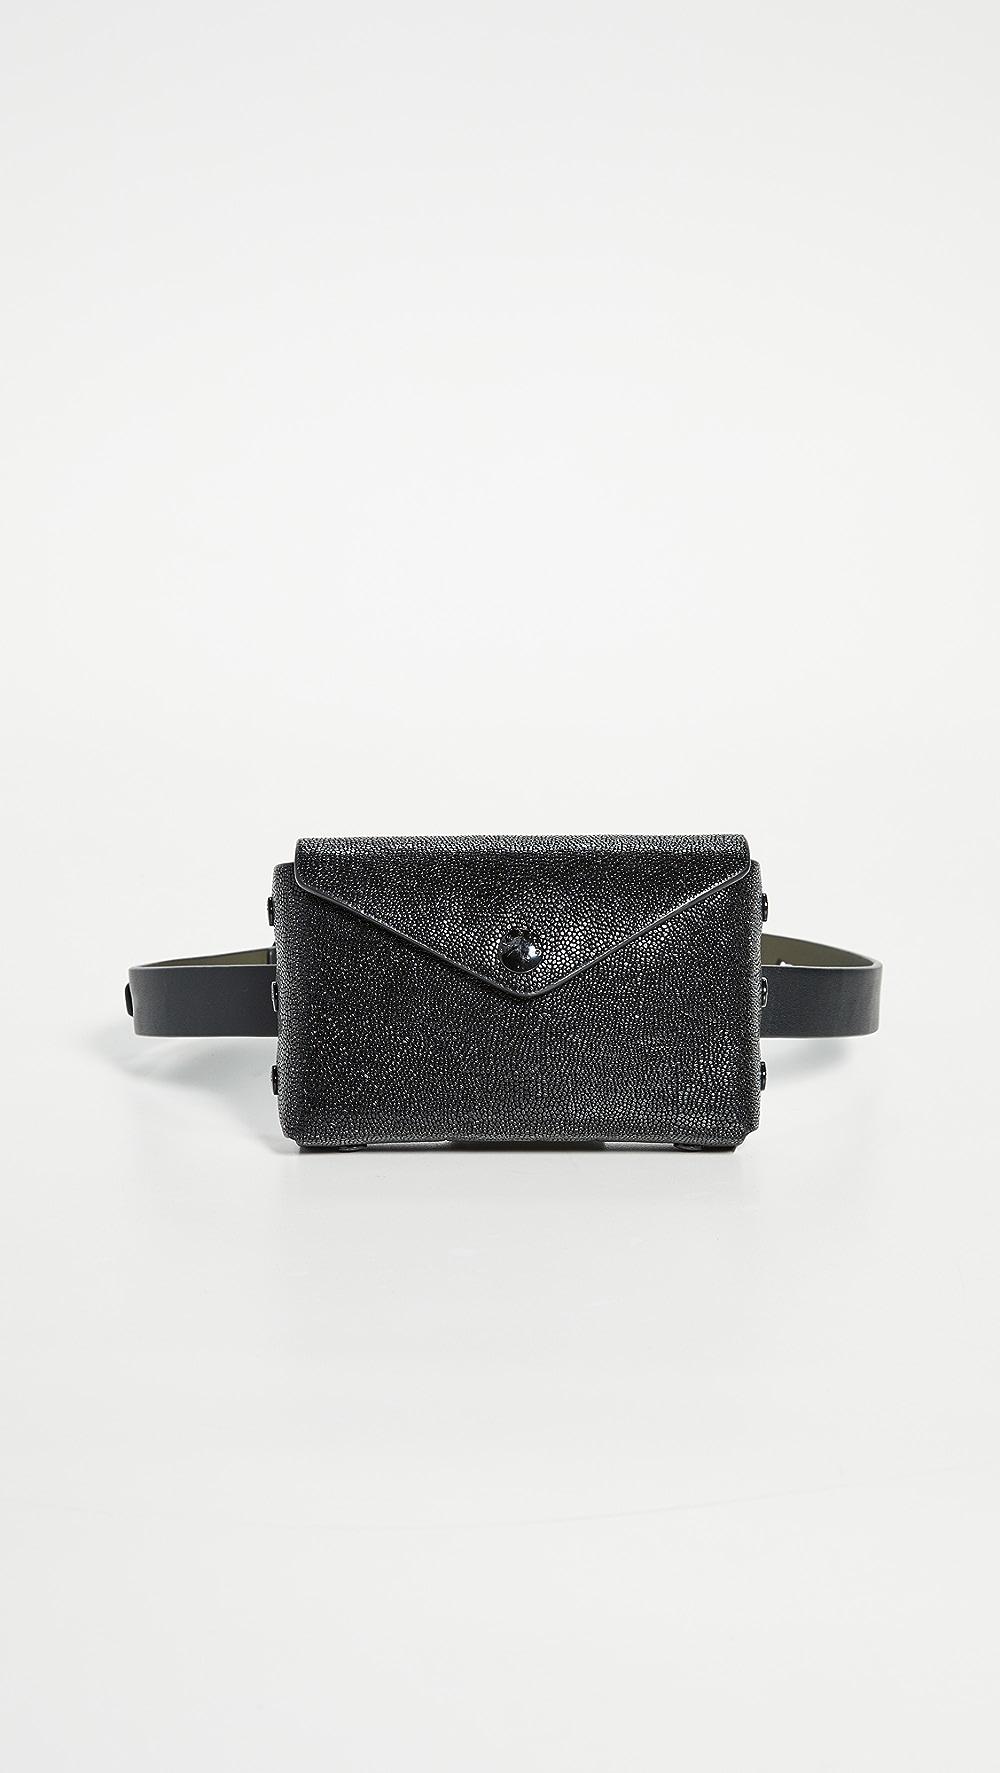 Just Rag & Bone - Atlas Belt Bag M/l Attractive And Durable